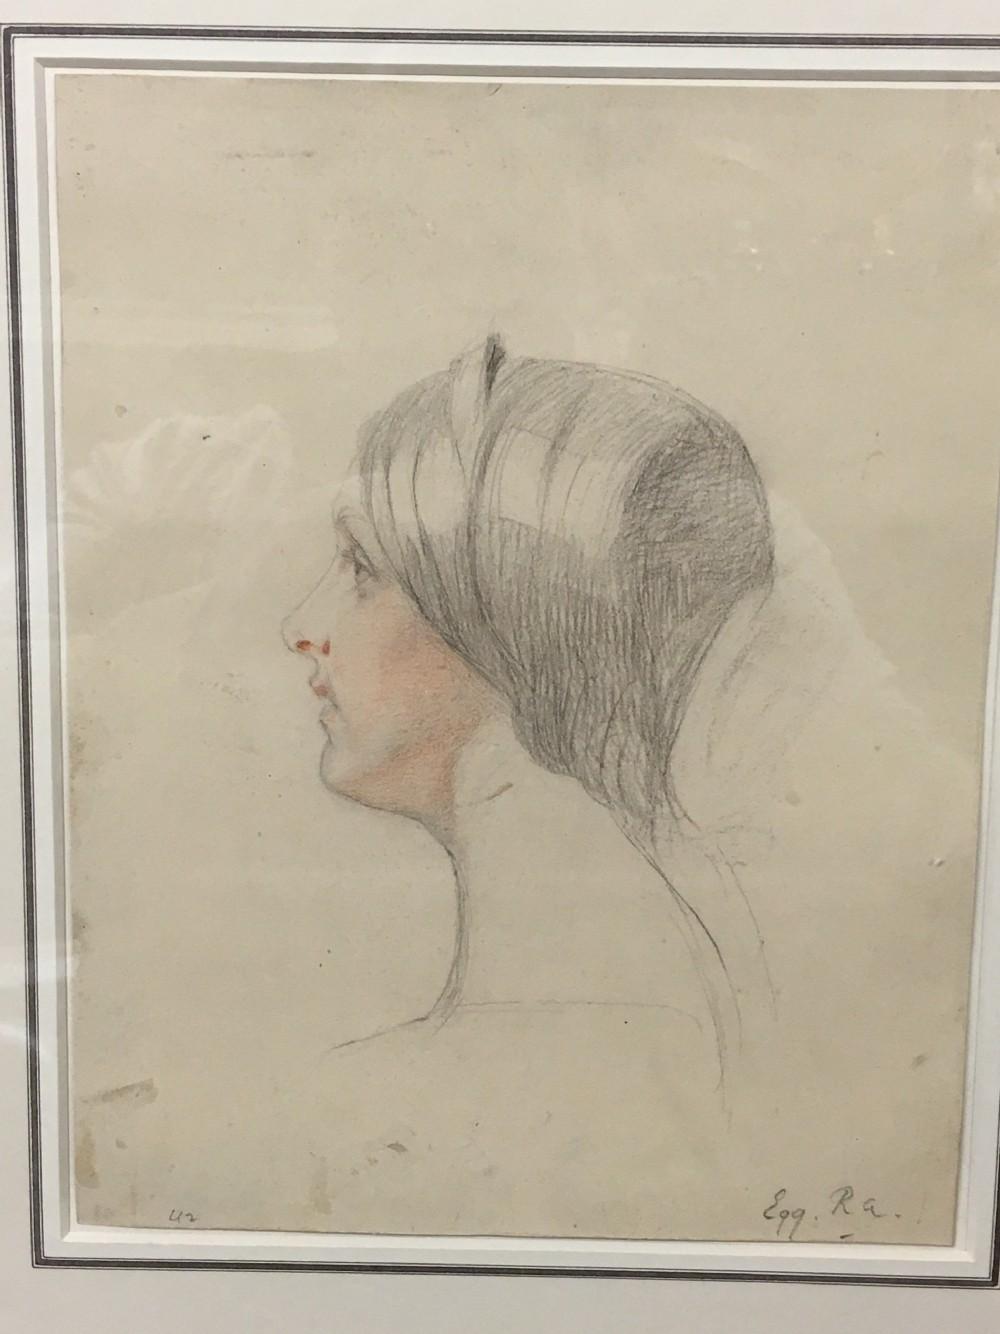 c19th portrait by augustus leonard egg181663